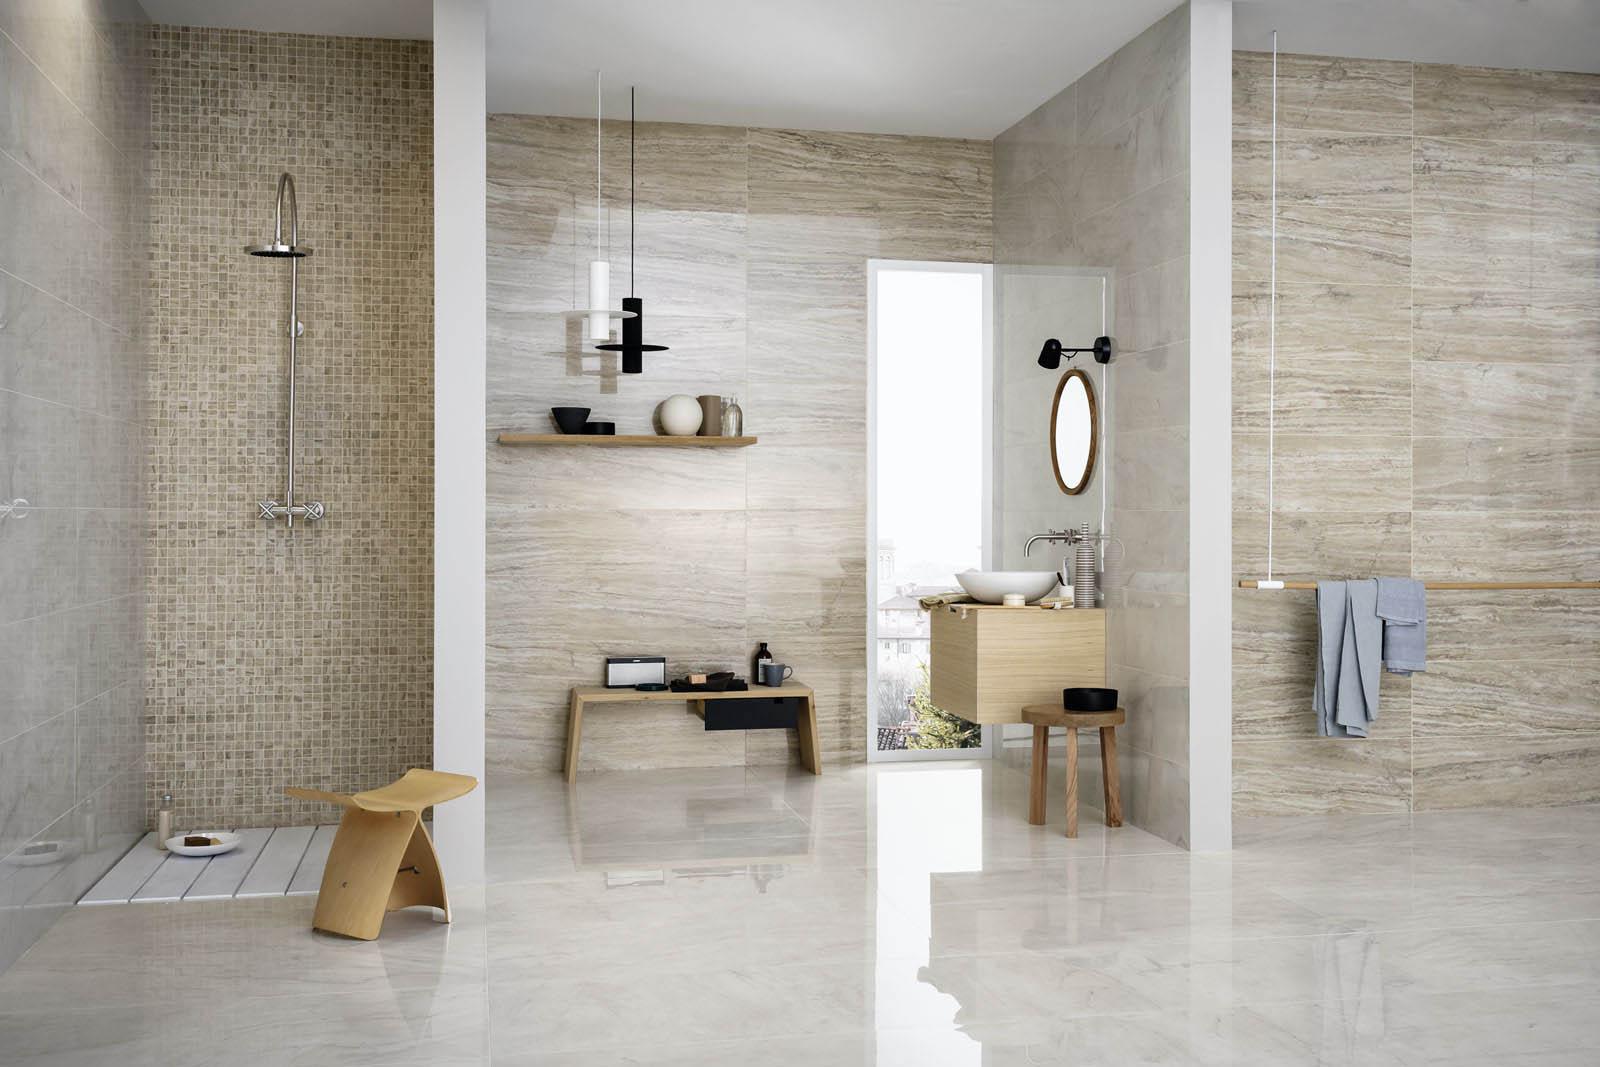 allmarble - feinsteinzeug in marmoroptik | marazzi, Hause ideen